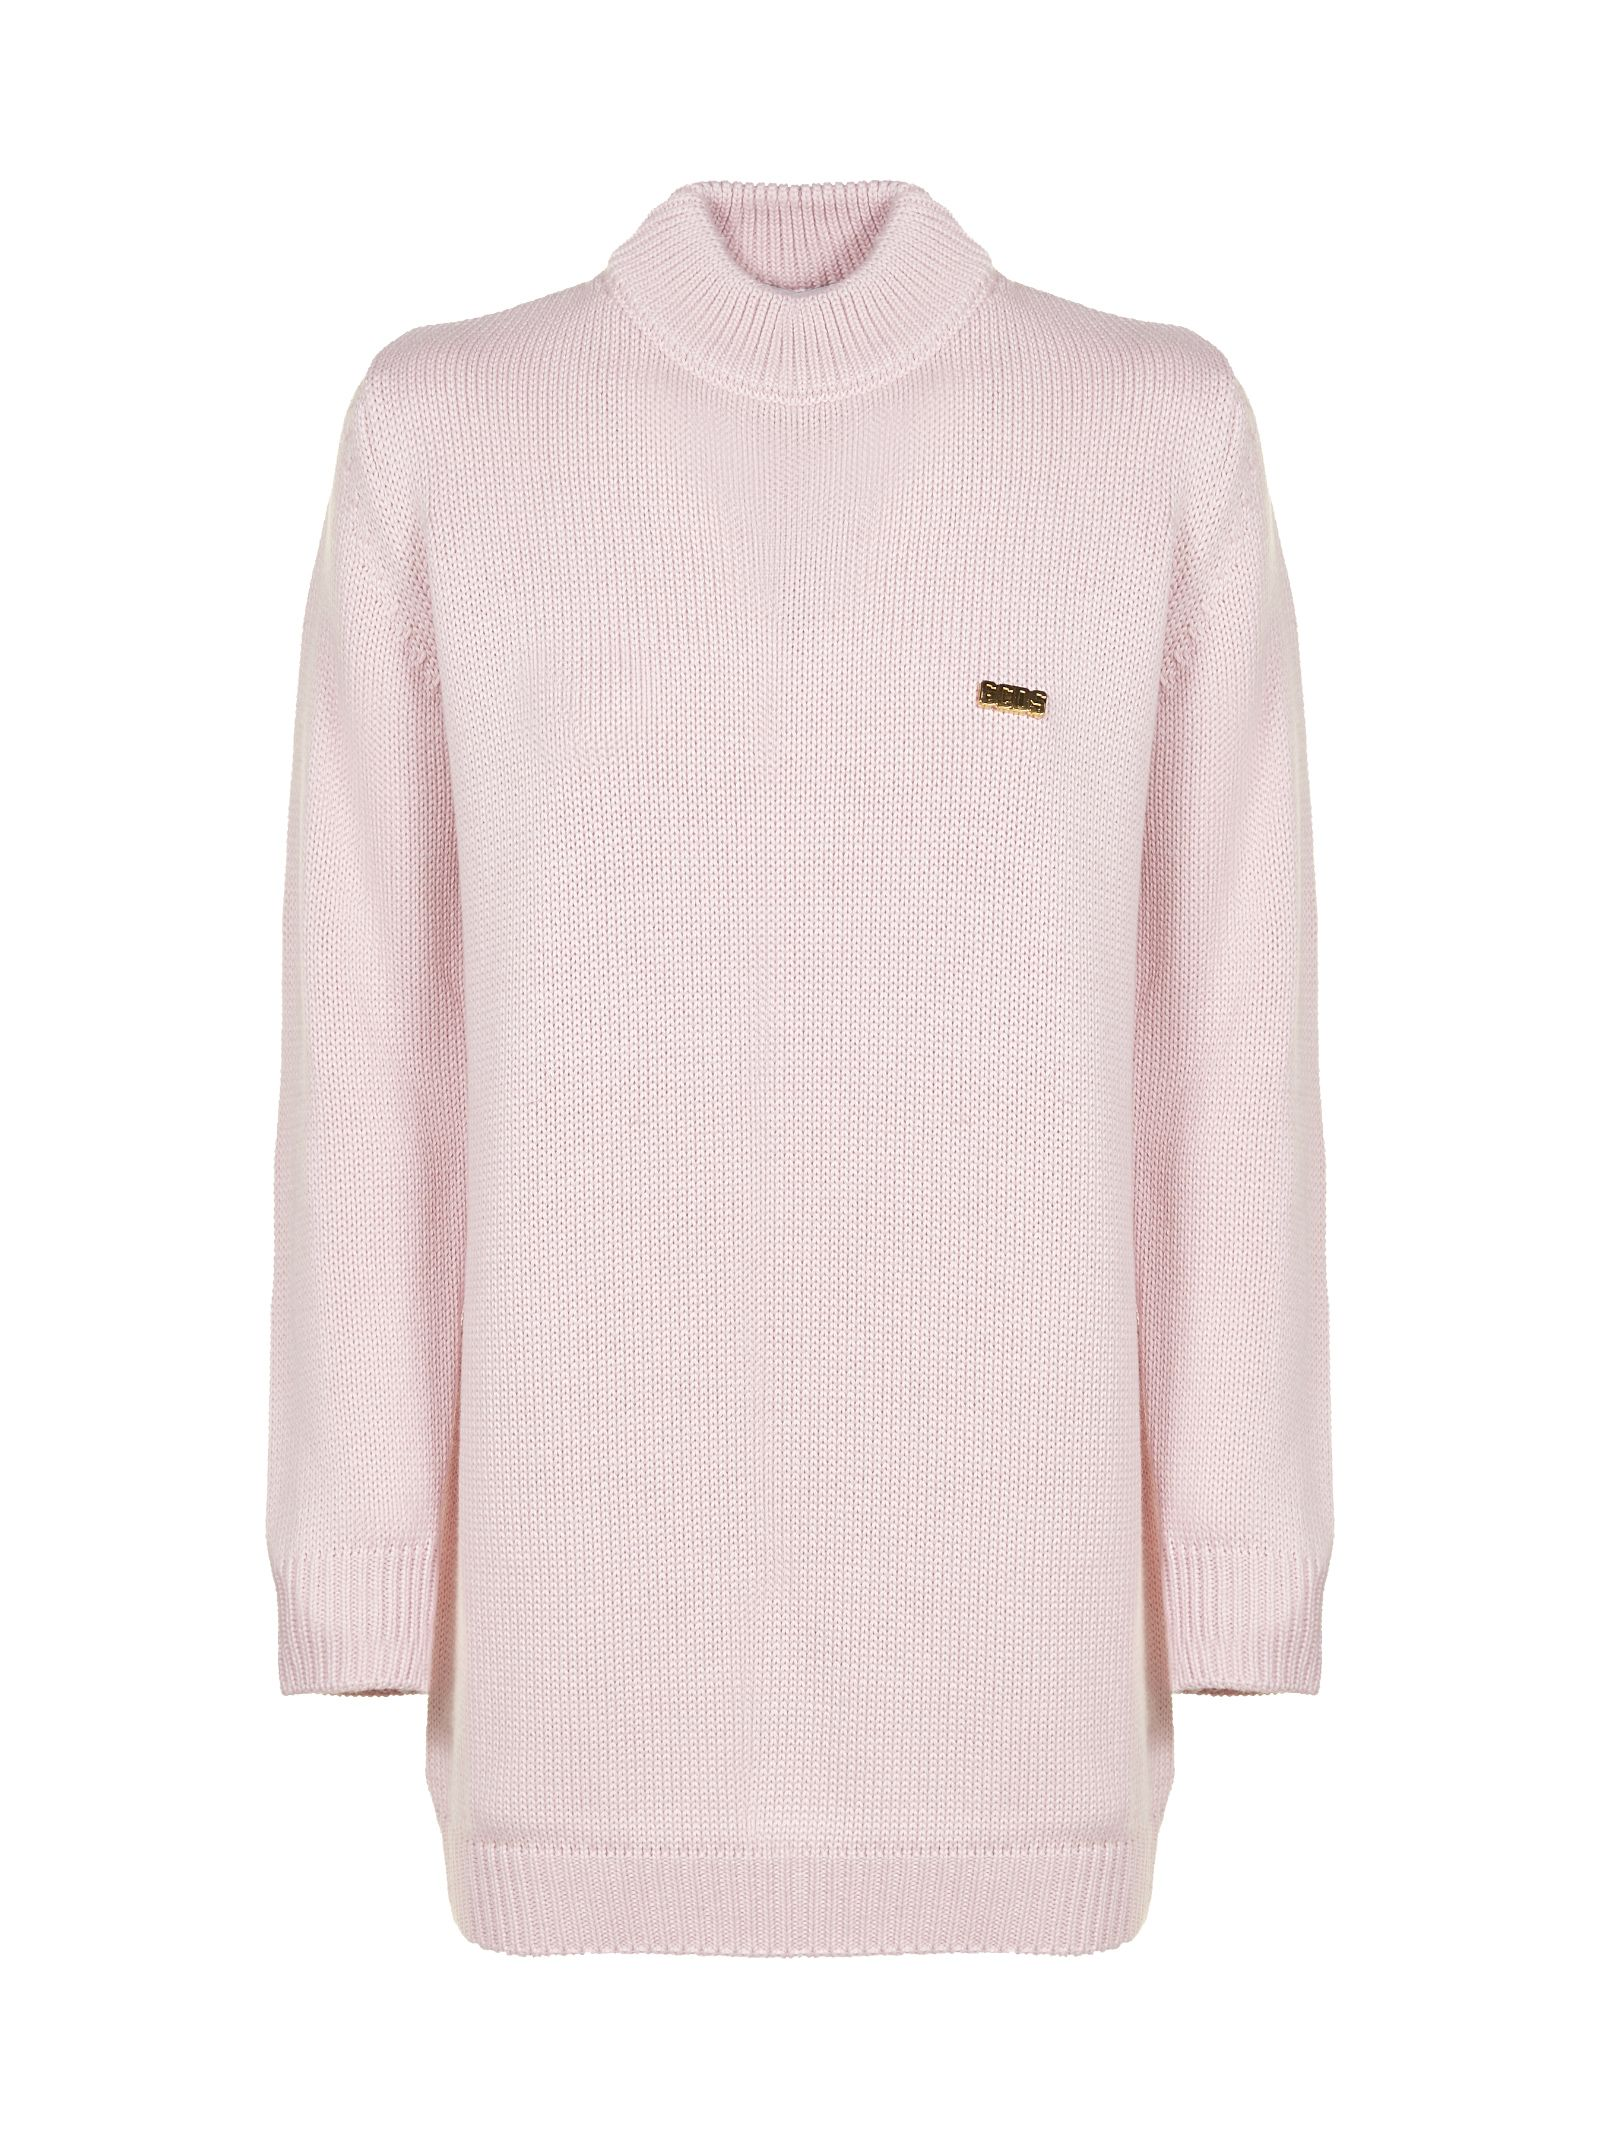 Gcds Knitted Sweater Dress